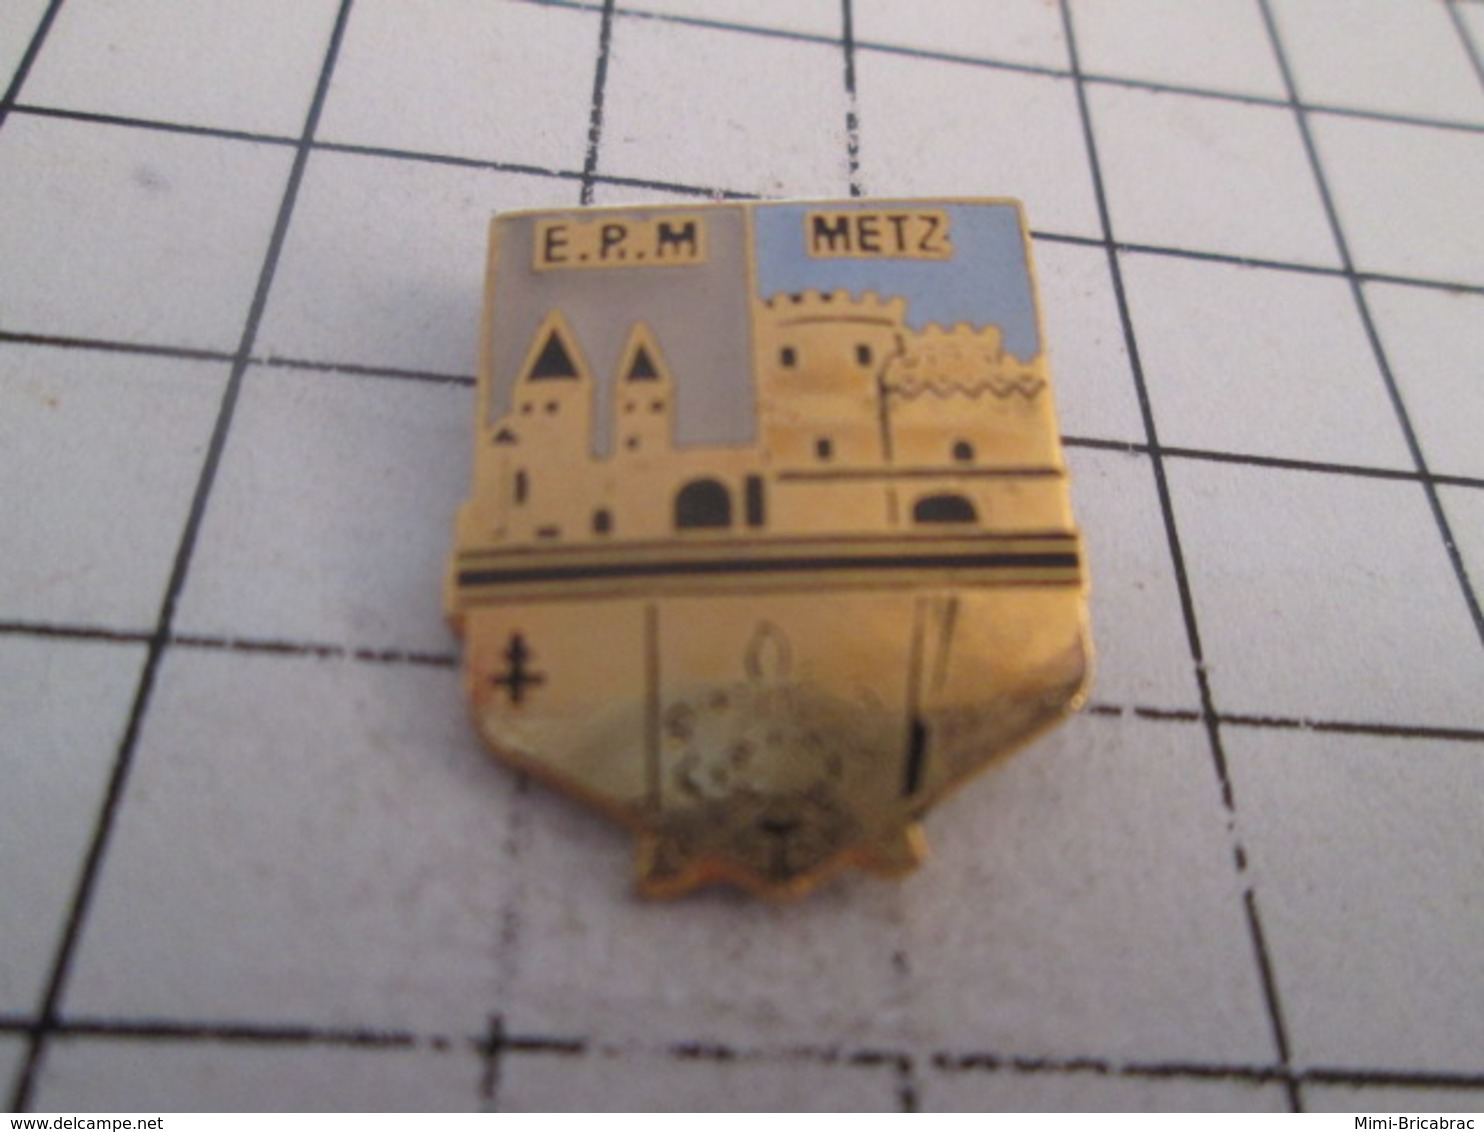 619  PINS PIN'S / Beau Et Rare : Thème MILITARIA / EPM METZ CHATEAU Numéroté 259 - Militaria